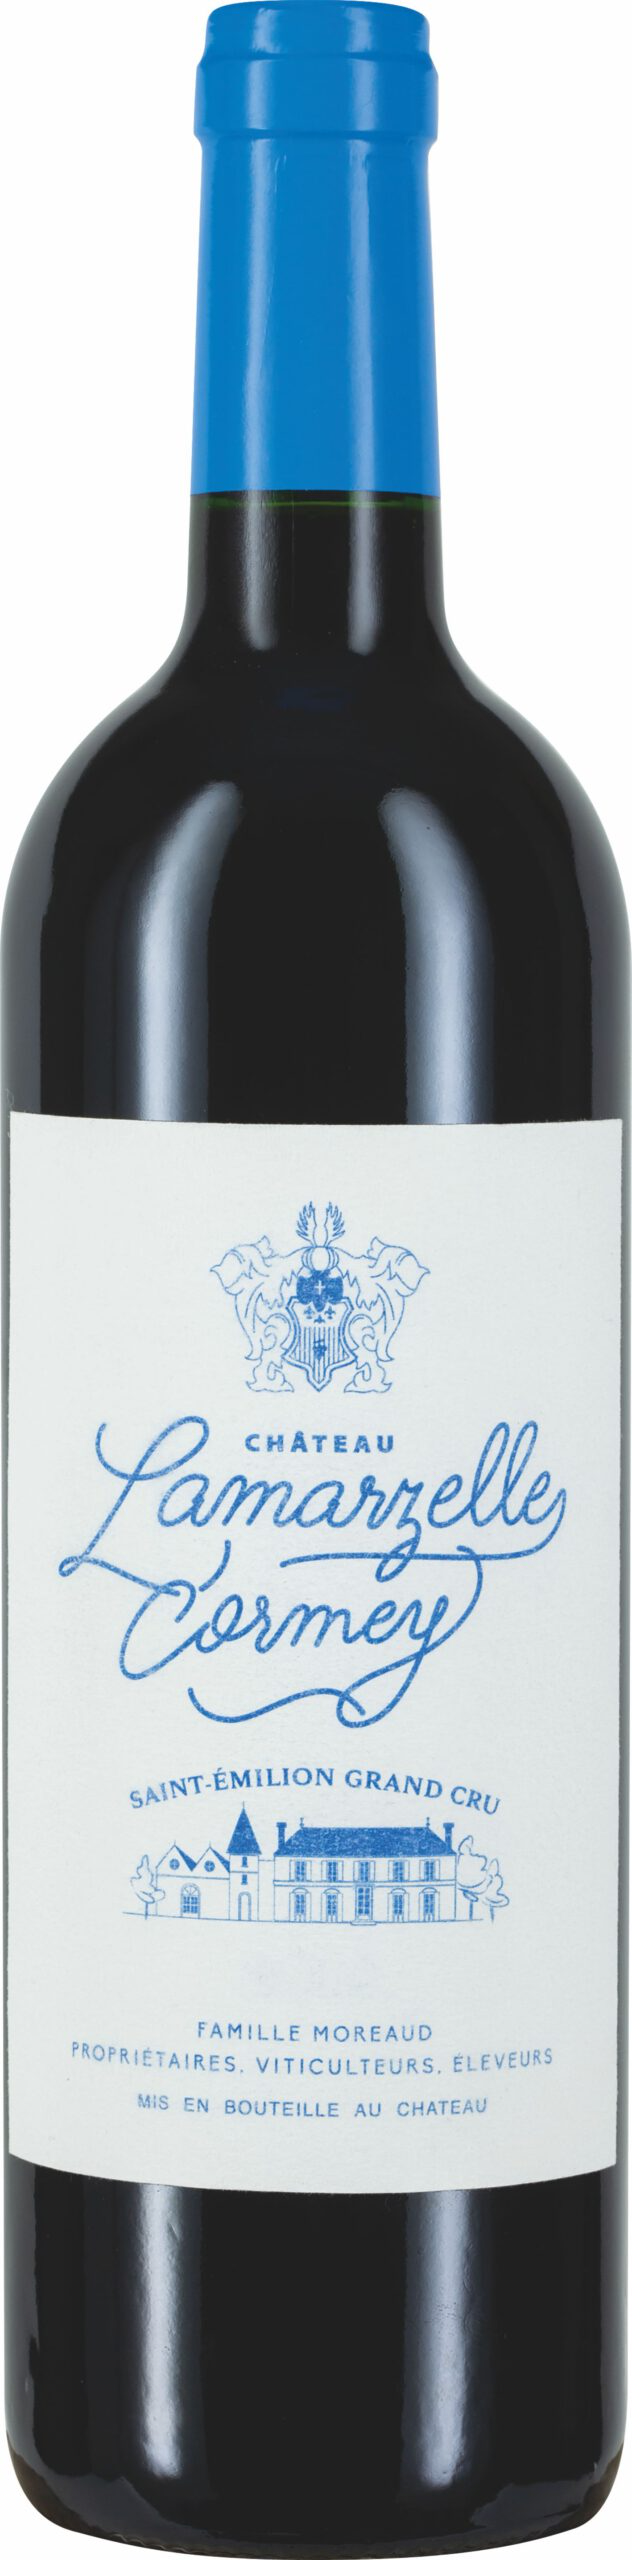 Chat. Lamarzelle Cormey, St. Emilion – Grand Cru BIO